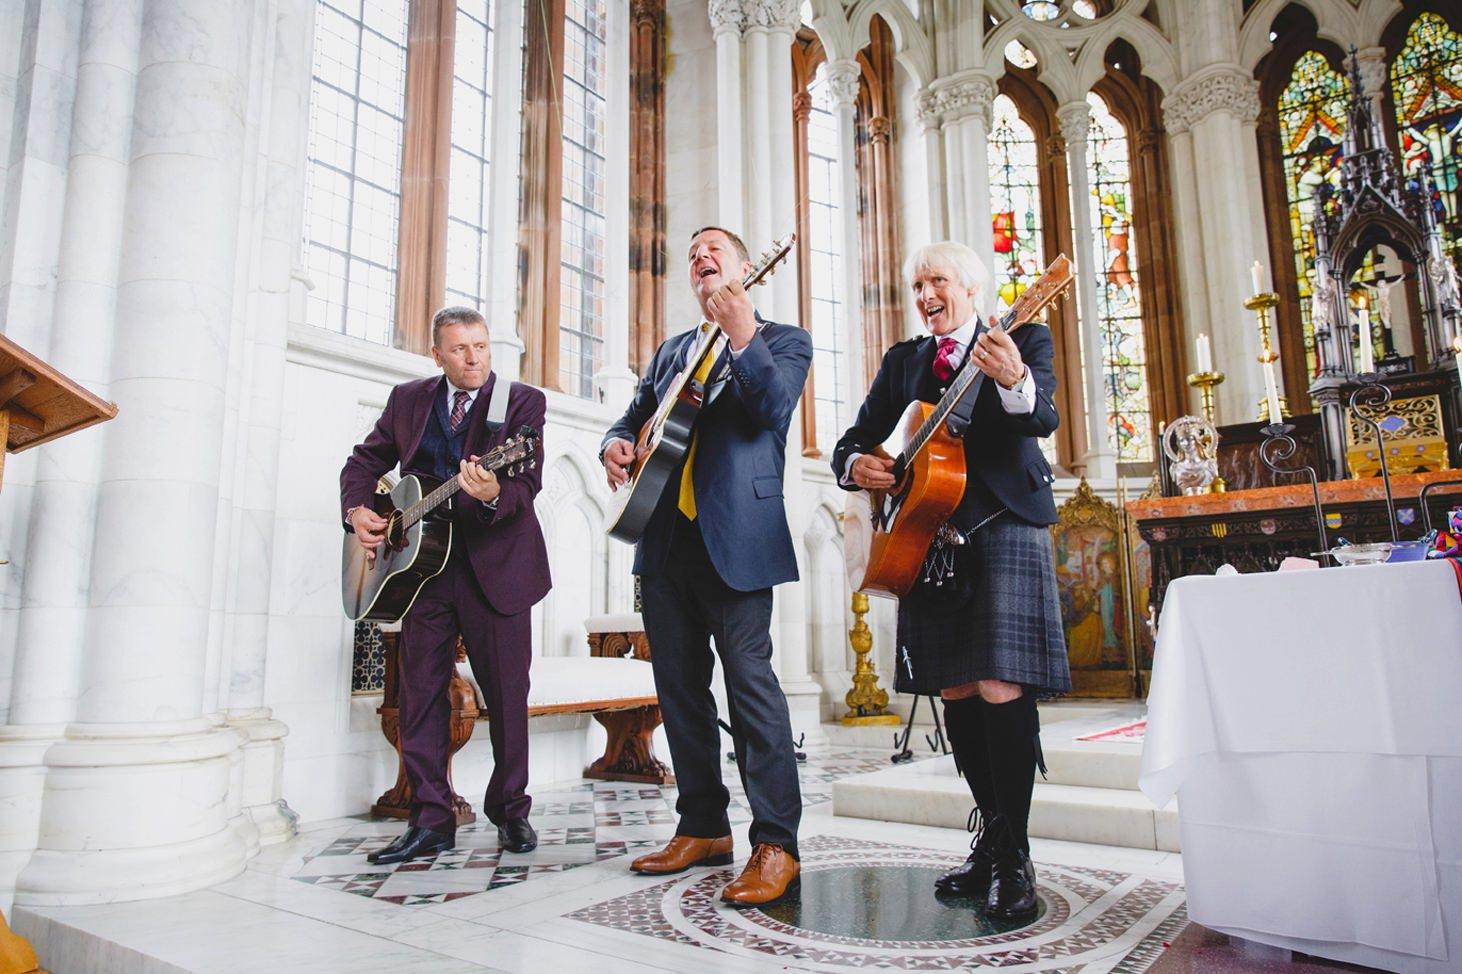 mount stuart wedding photography wedding band